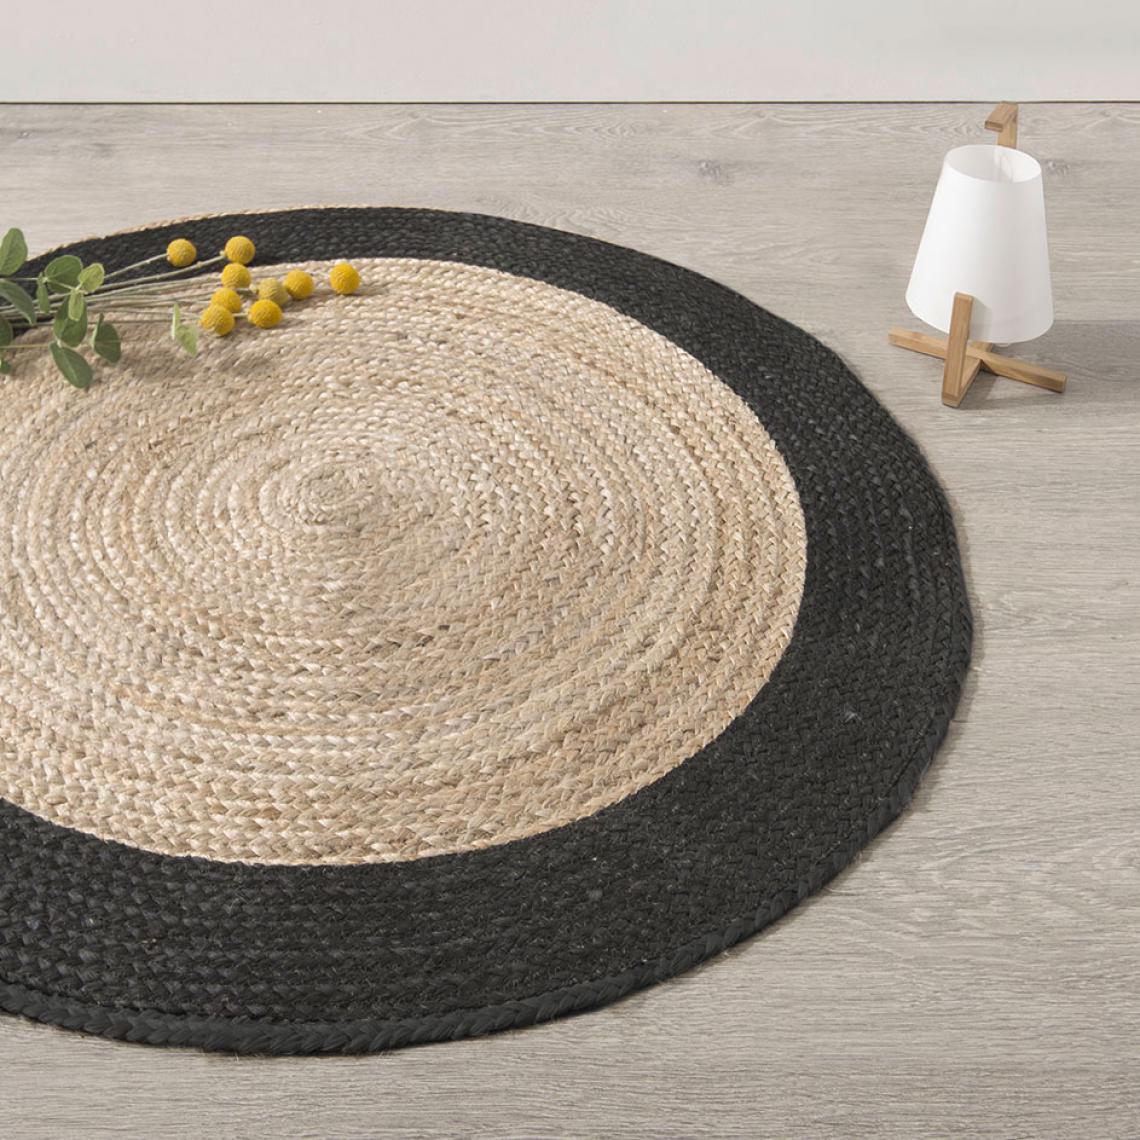 tapis en jute beige bordure noire